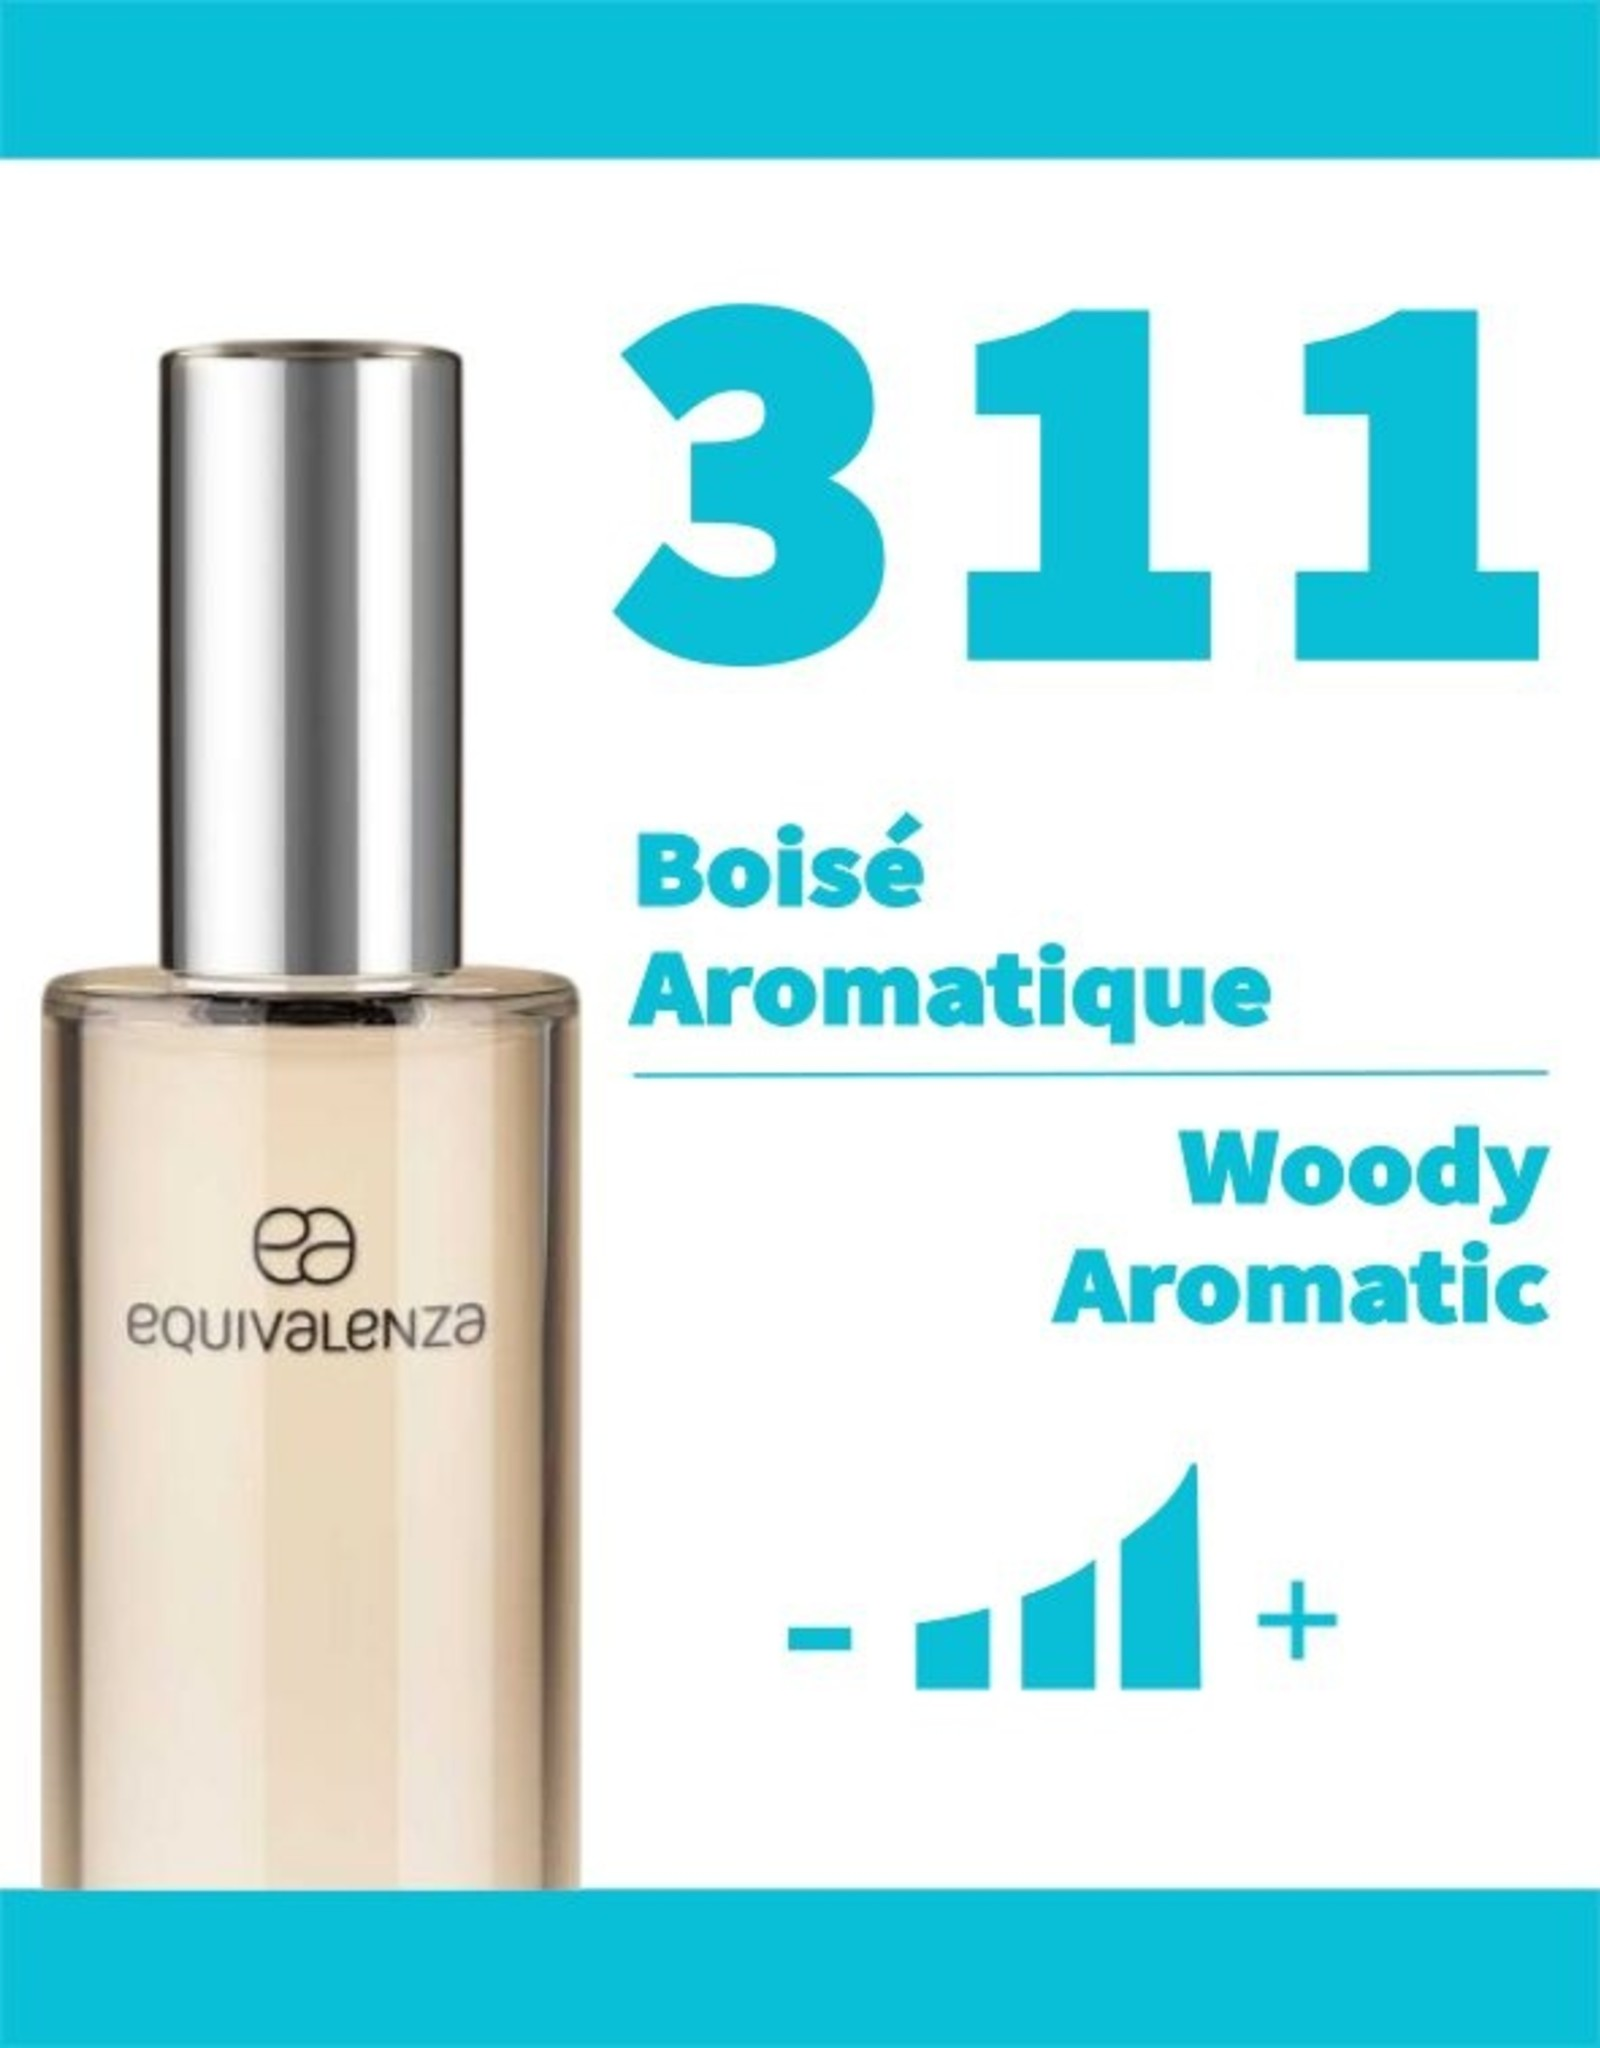 Equivalenza Eau de Parfum Woody Aromatic 311